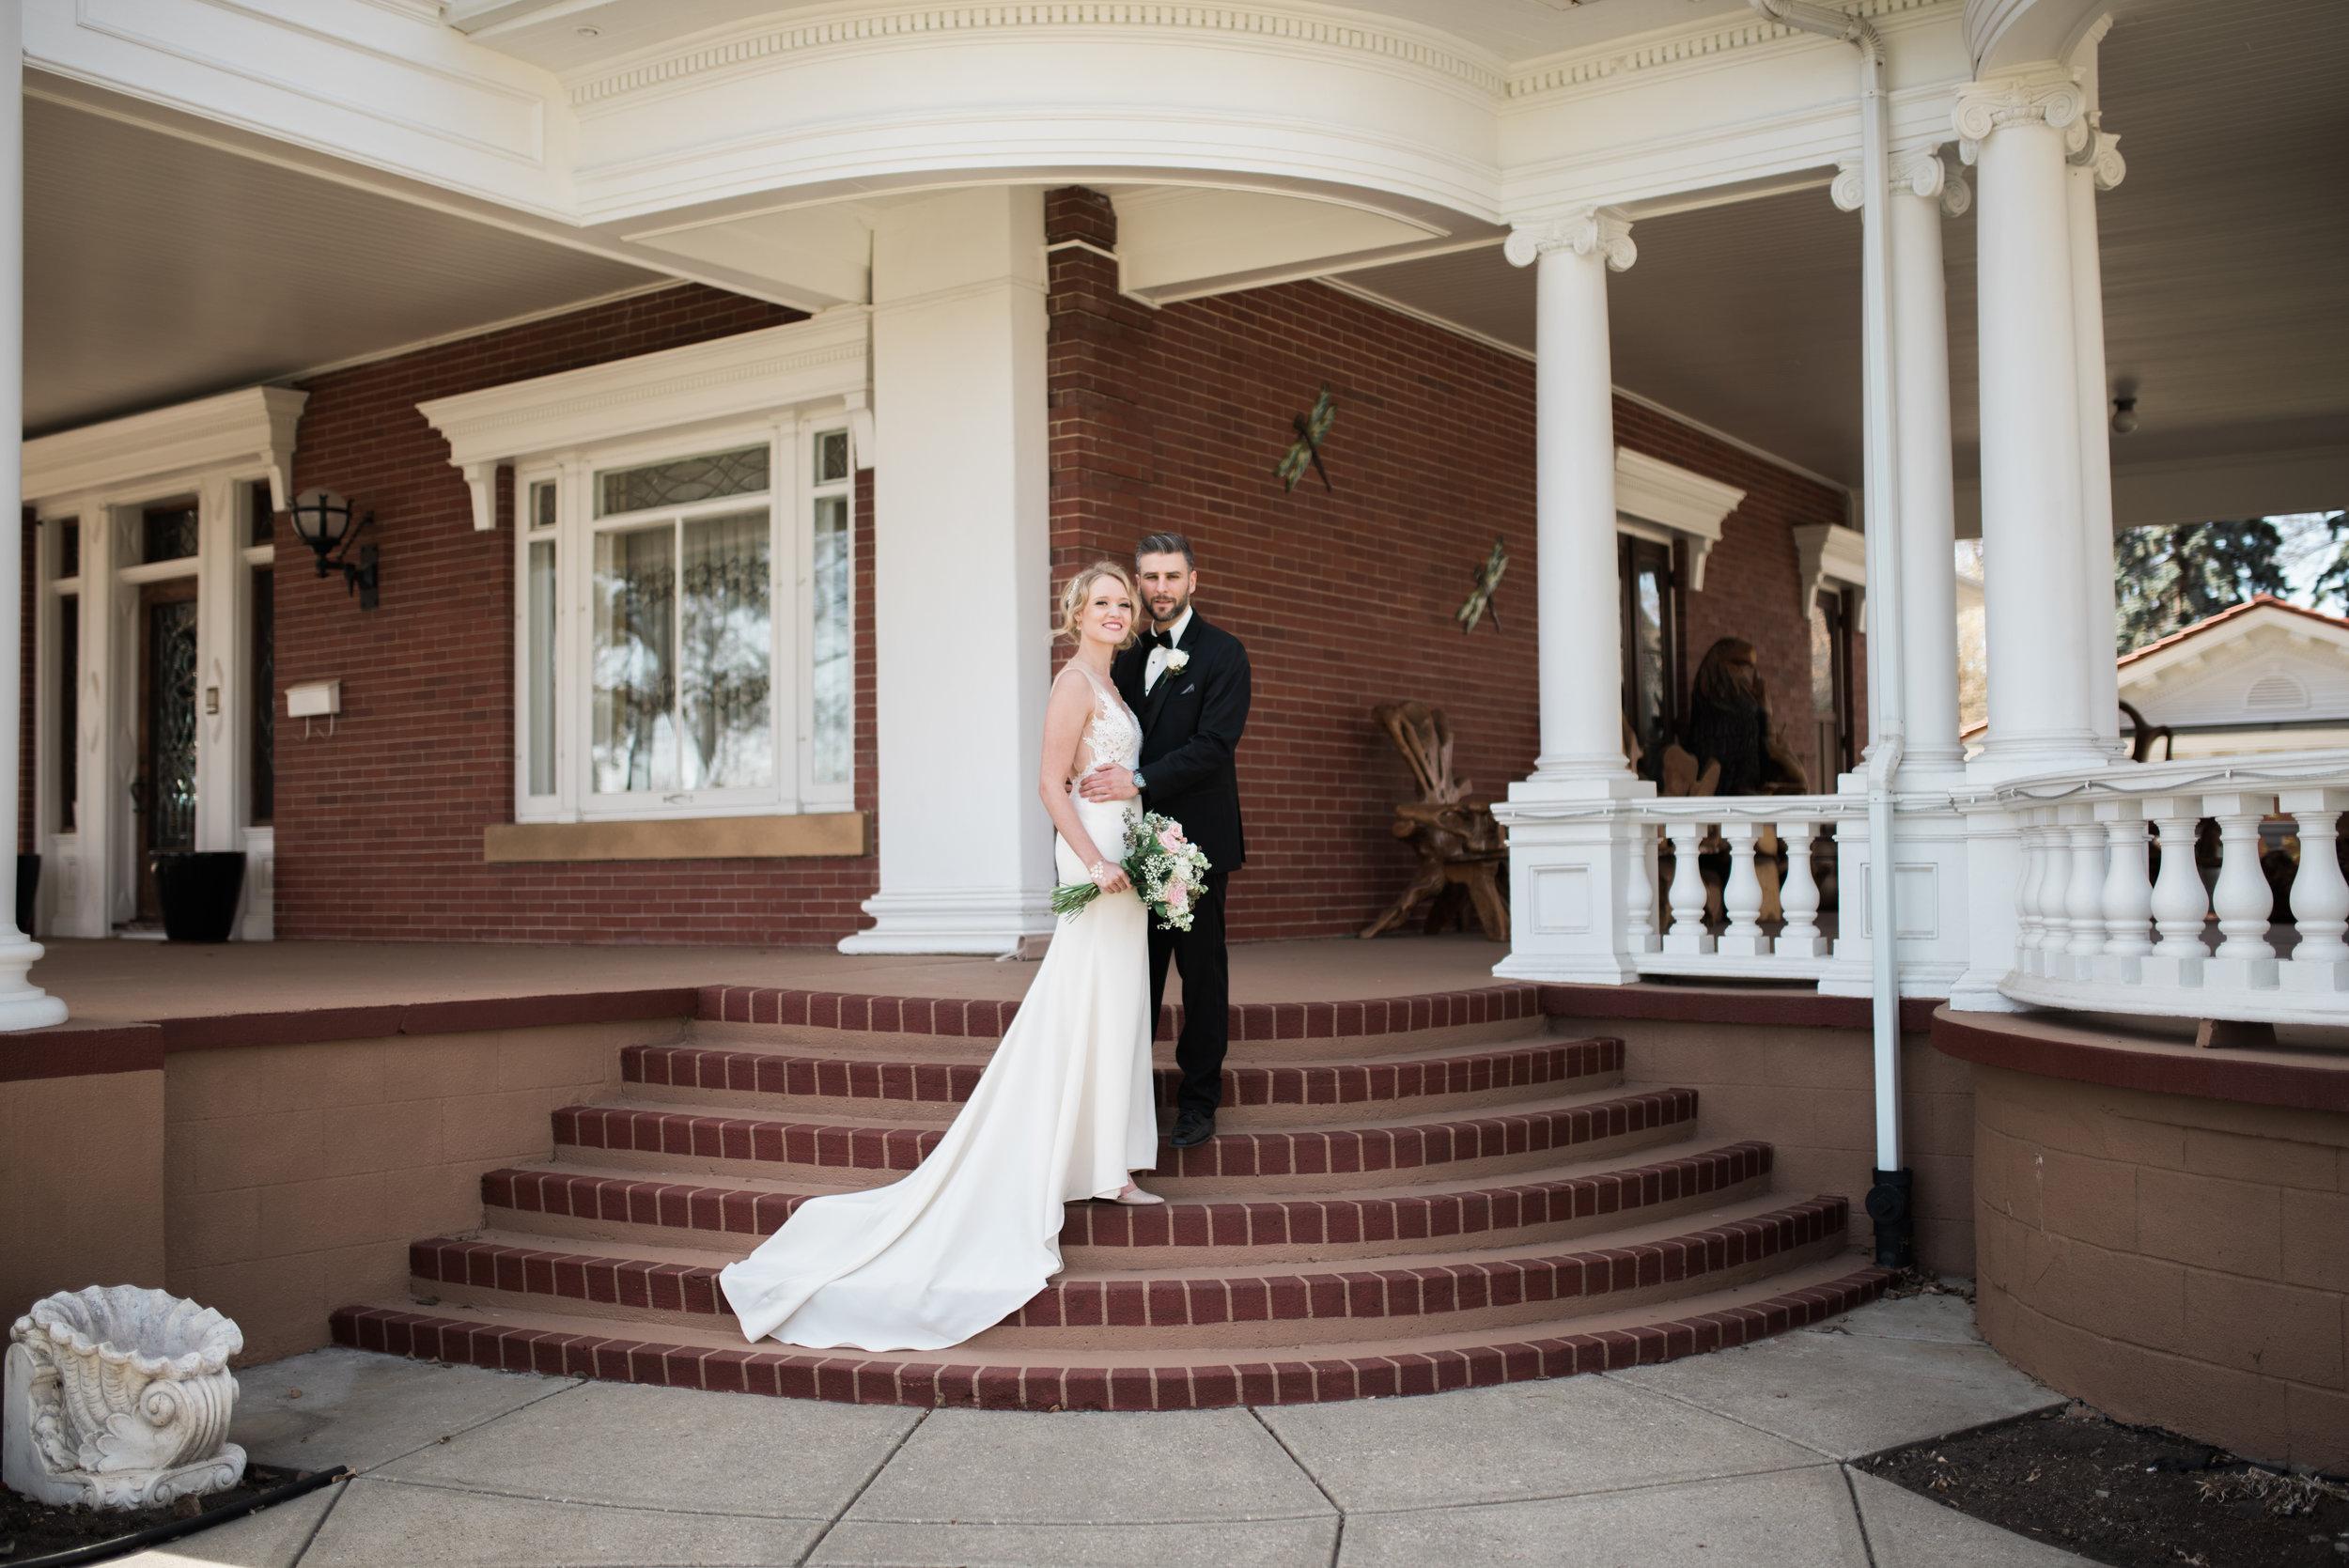 Ali Samantha Wedding 1450.jpg